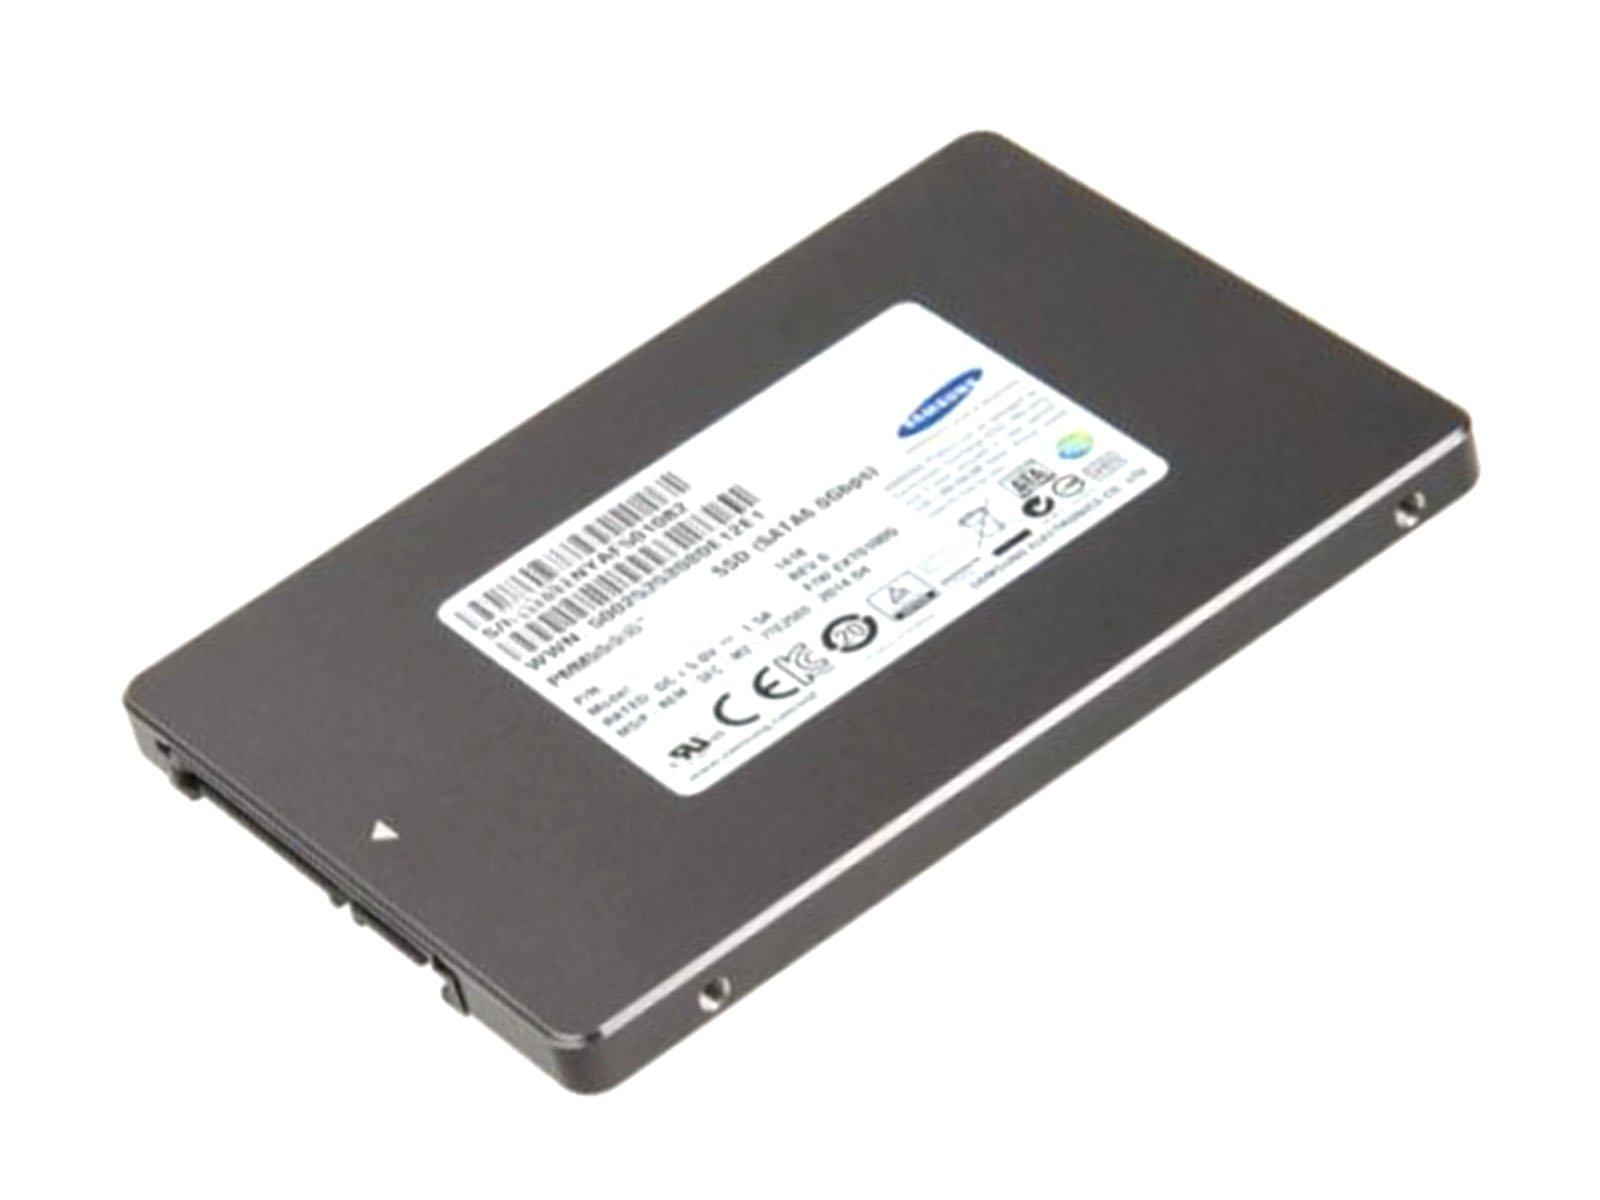 Samsung SSD HDD PM851 2.5'' 7mm 256GB MZ-7TE2560 MZ7TE256HMHP-00000 SATA 3.0 6.0Gb/s MLC Hard Disk Solid State Drive Laptop by Samsung